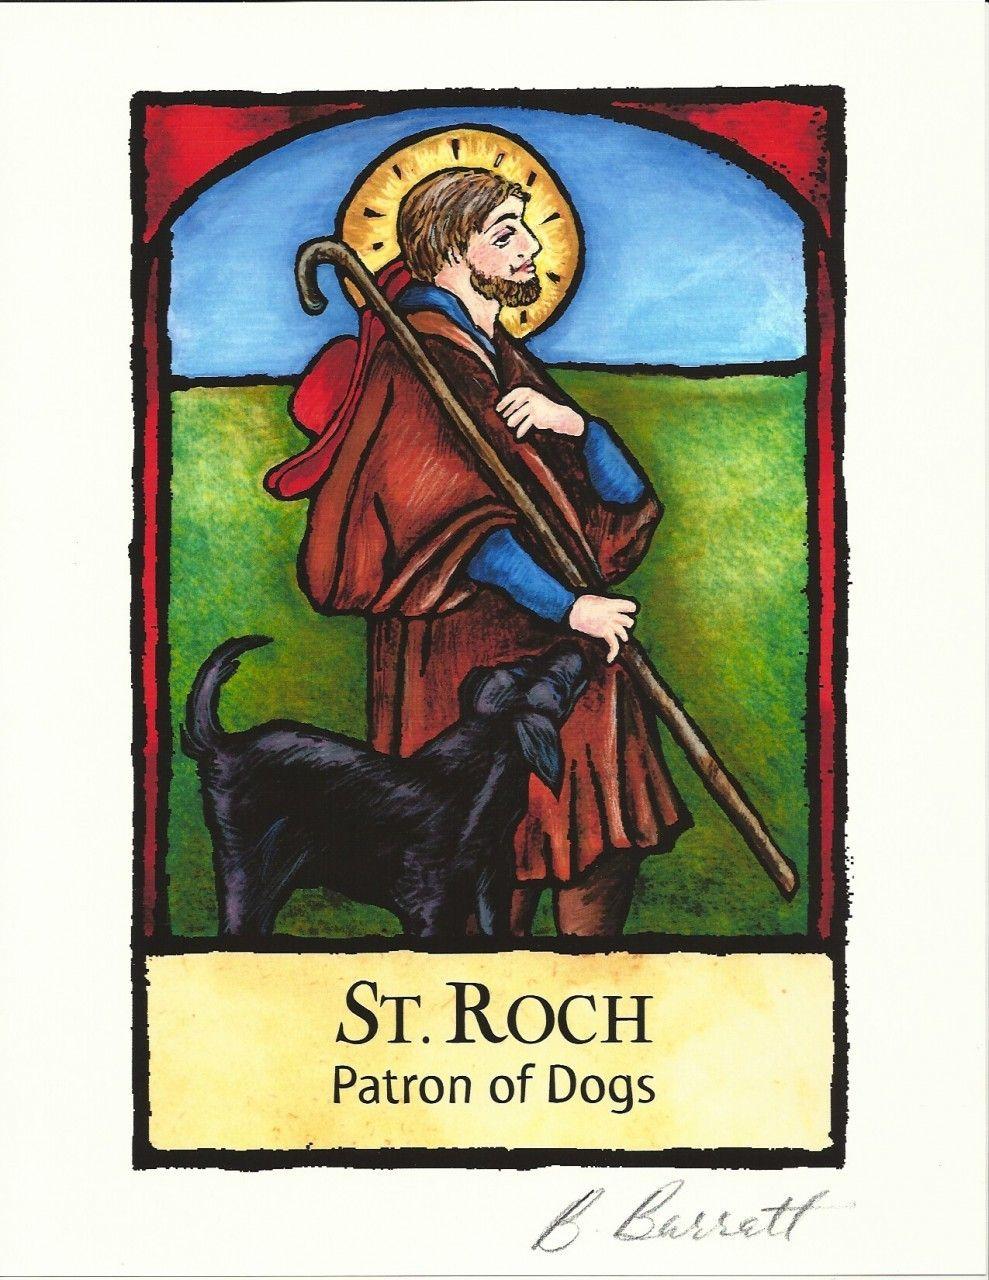 Patron of Dogs Art Print Saint Roch Illustration by